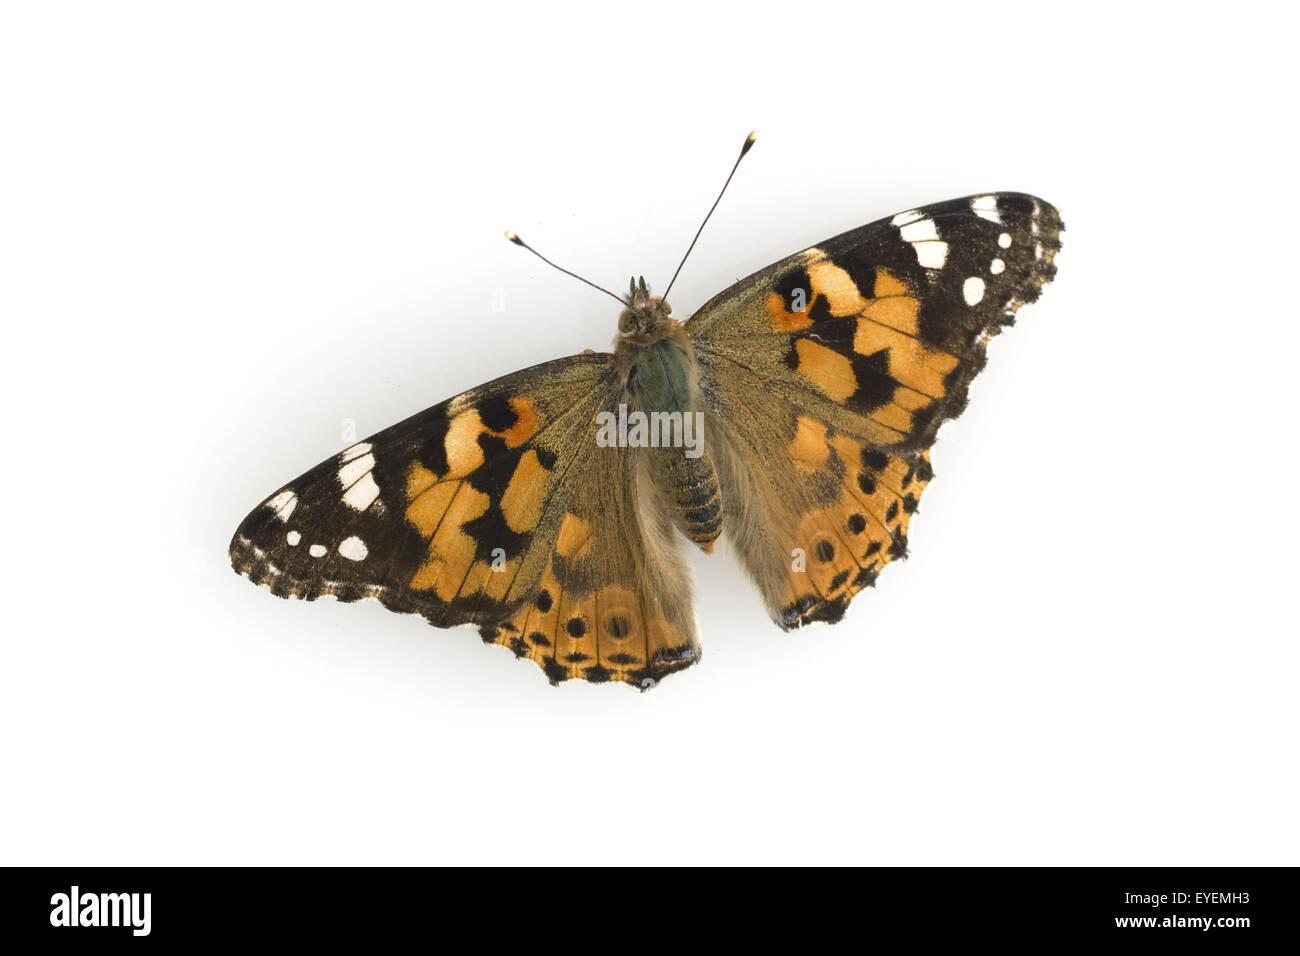 Distelfalter, Cynthia, cardui, Insekt, - Stock Image